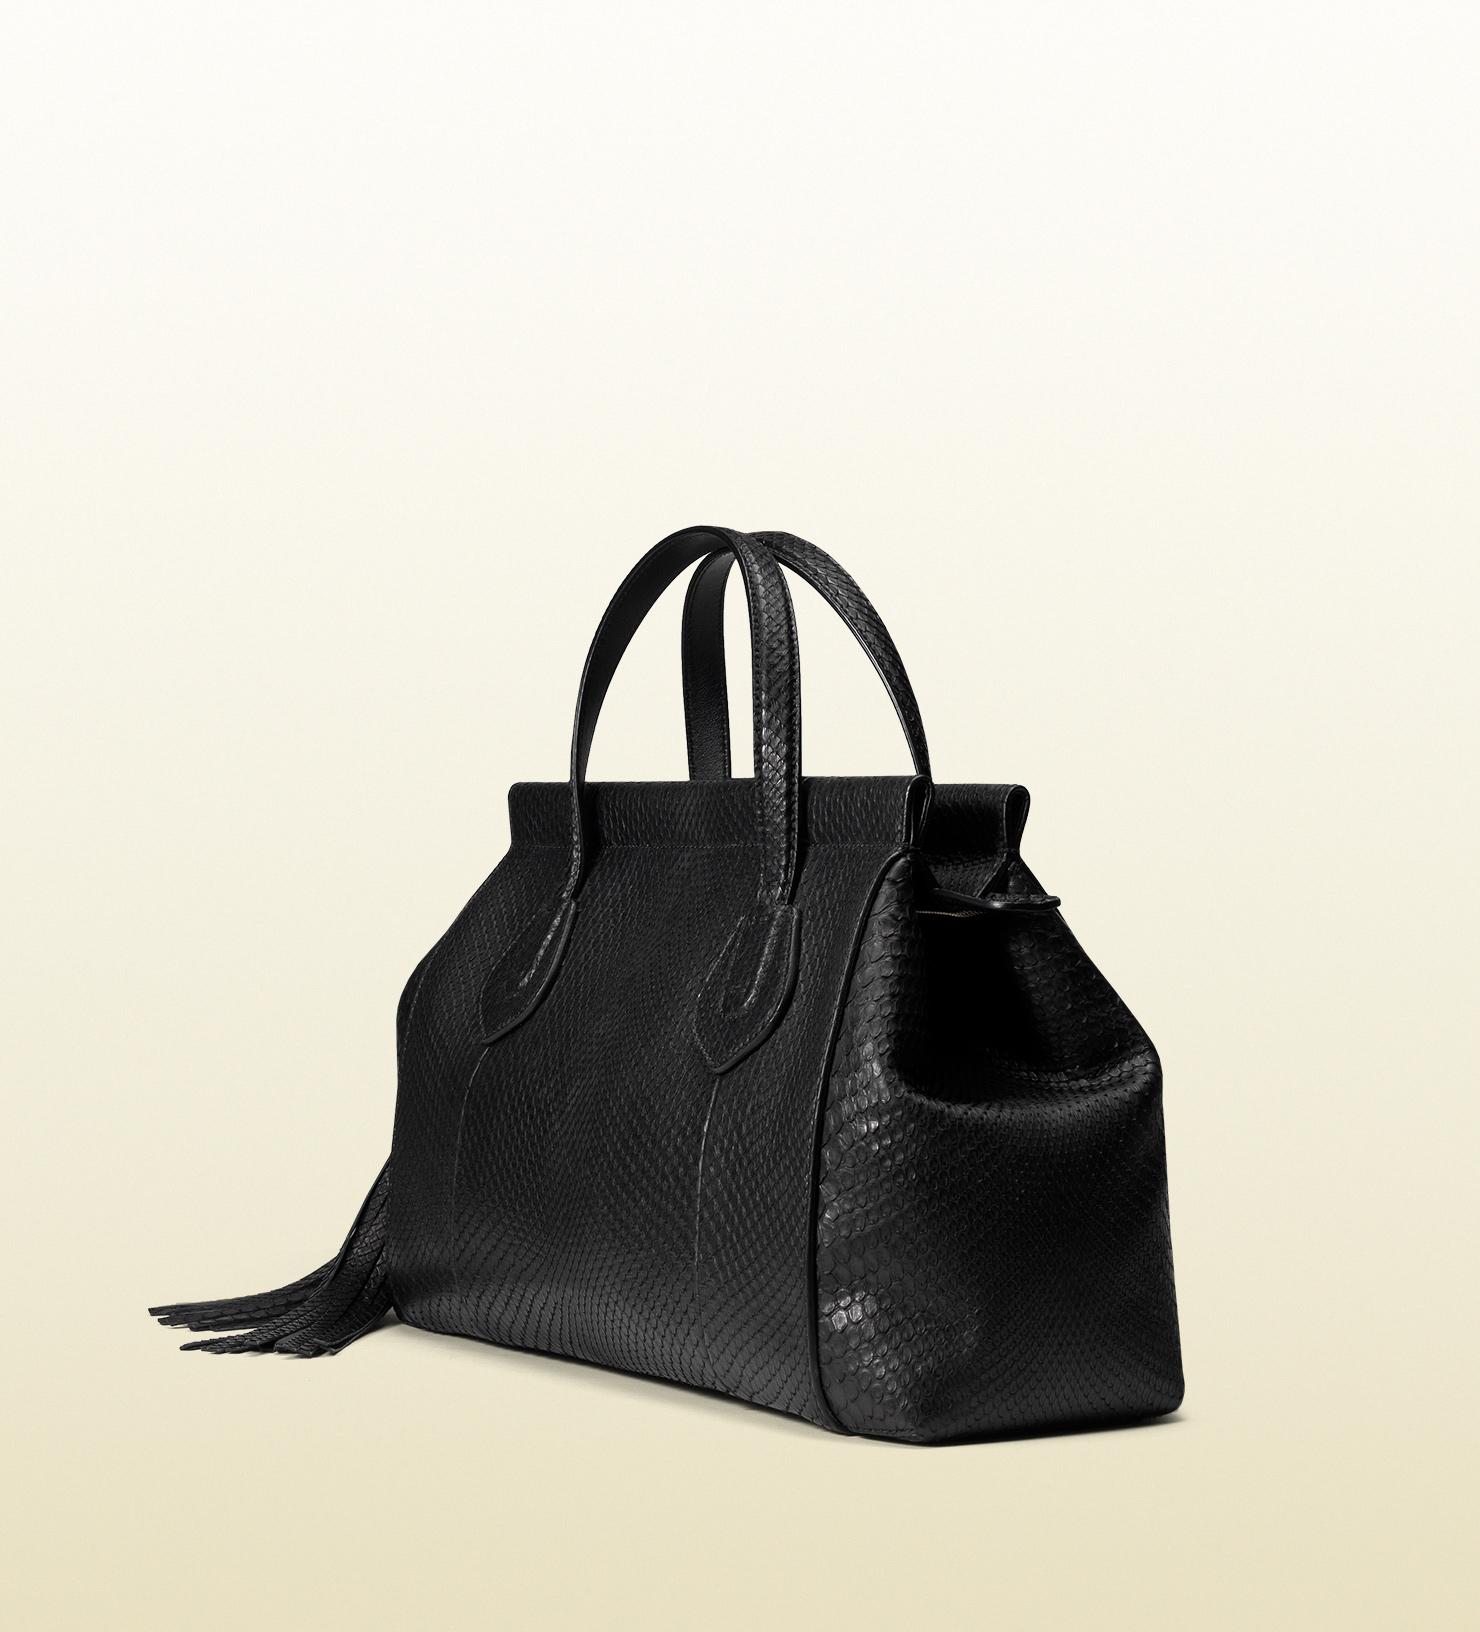 eefff70c3345 Gucci Black Python Leather Stirrup Top Handle Hobo Bag. Gucci Python Small  Soho Chain Shoulder ...